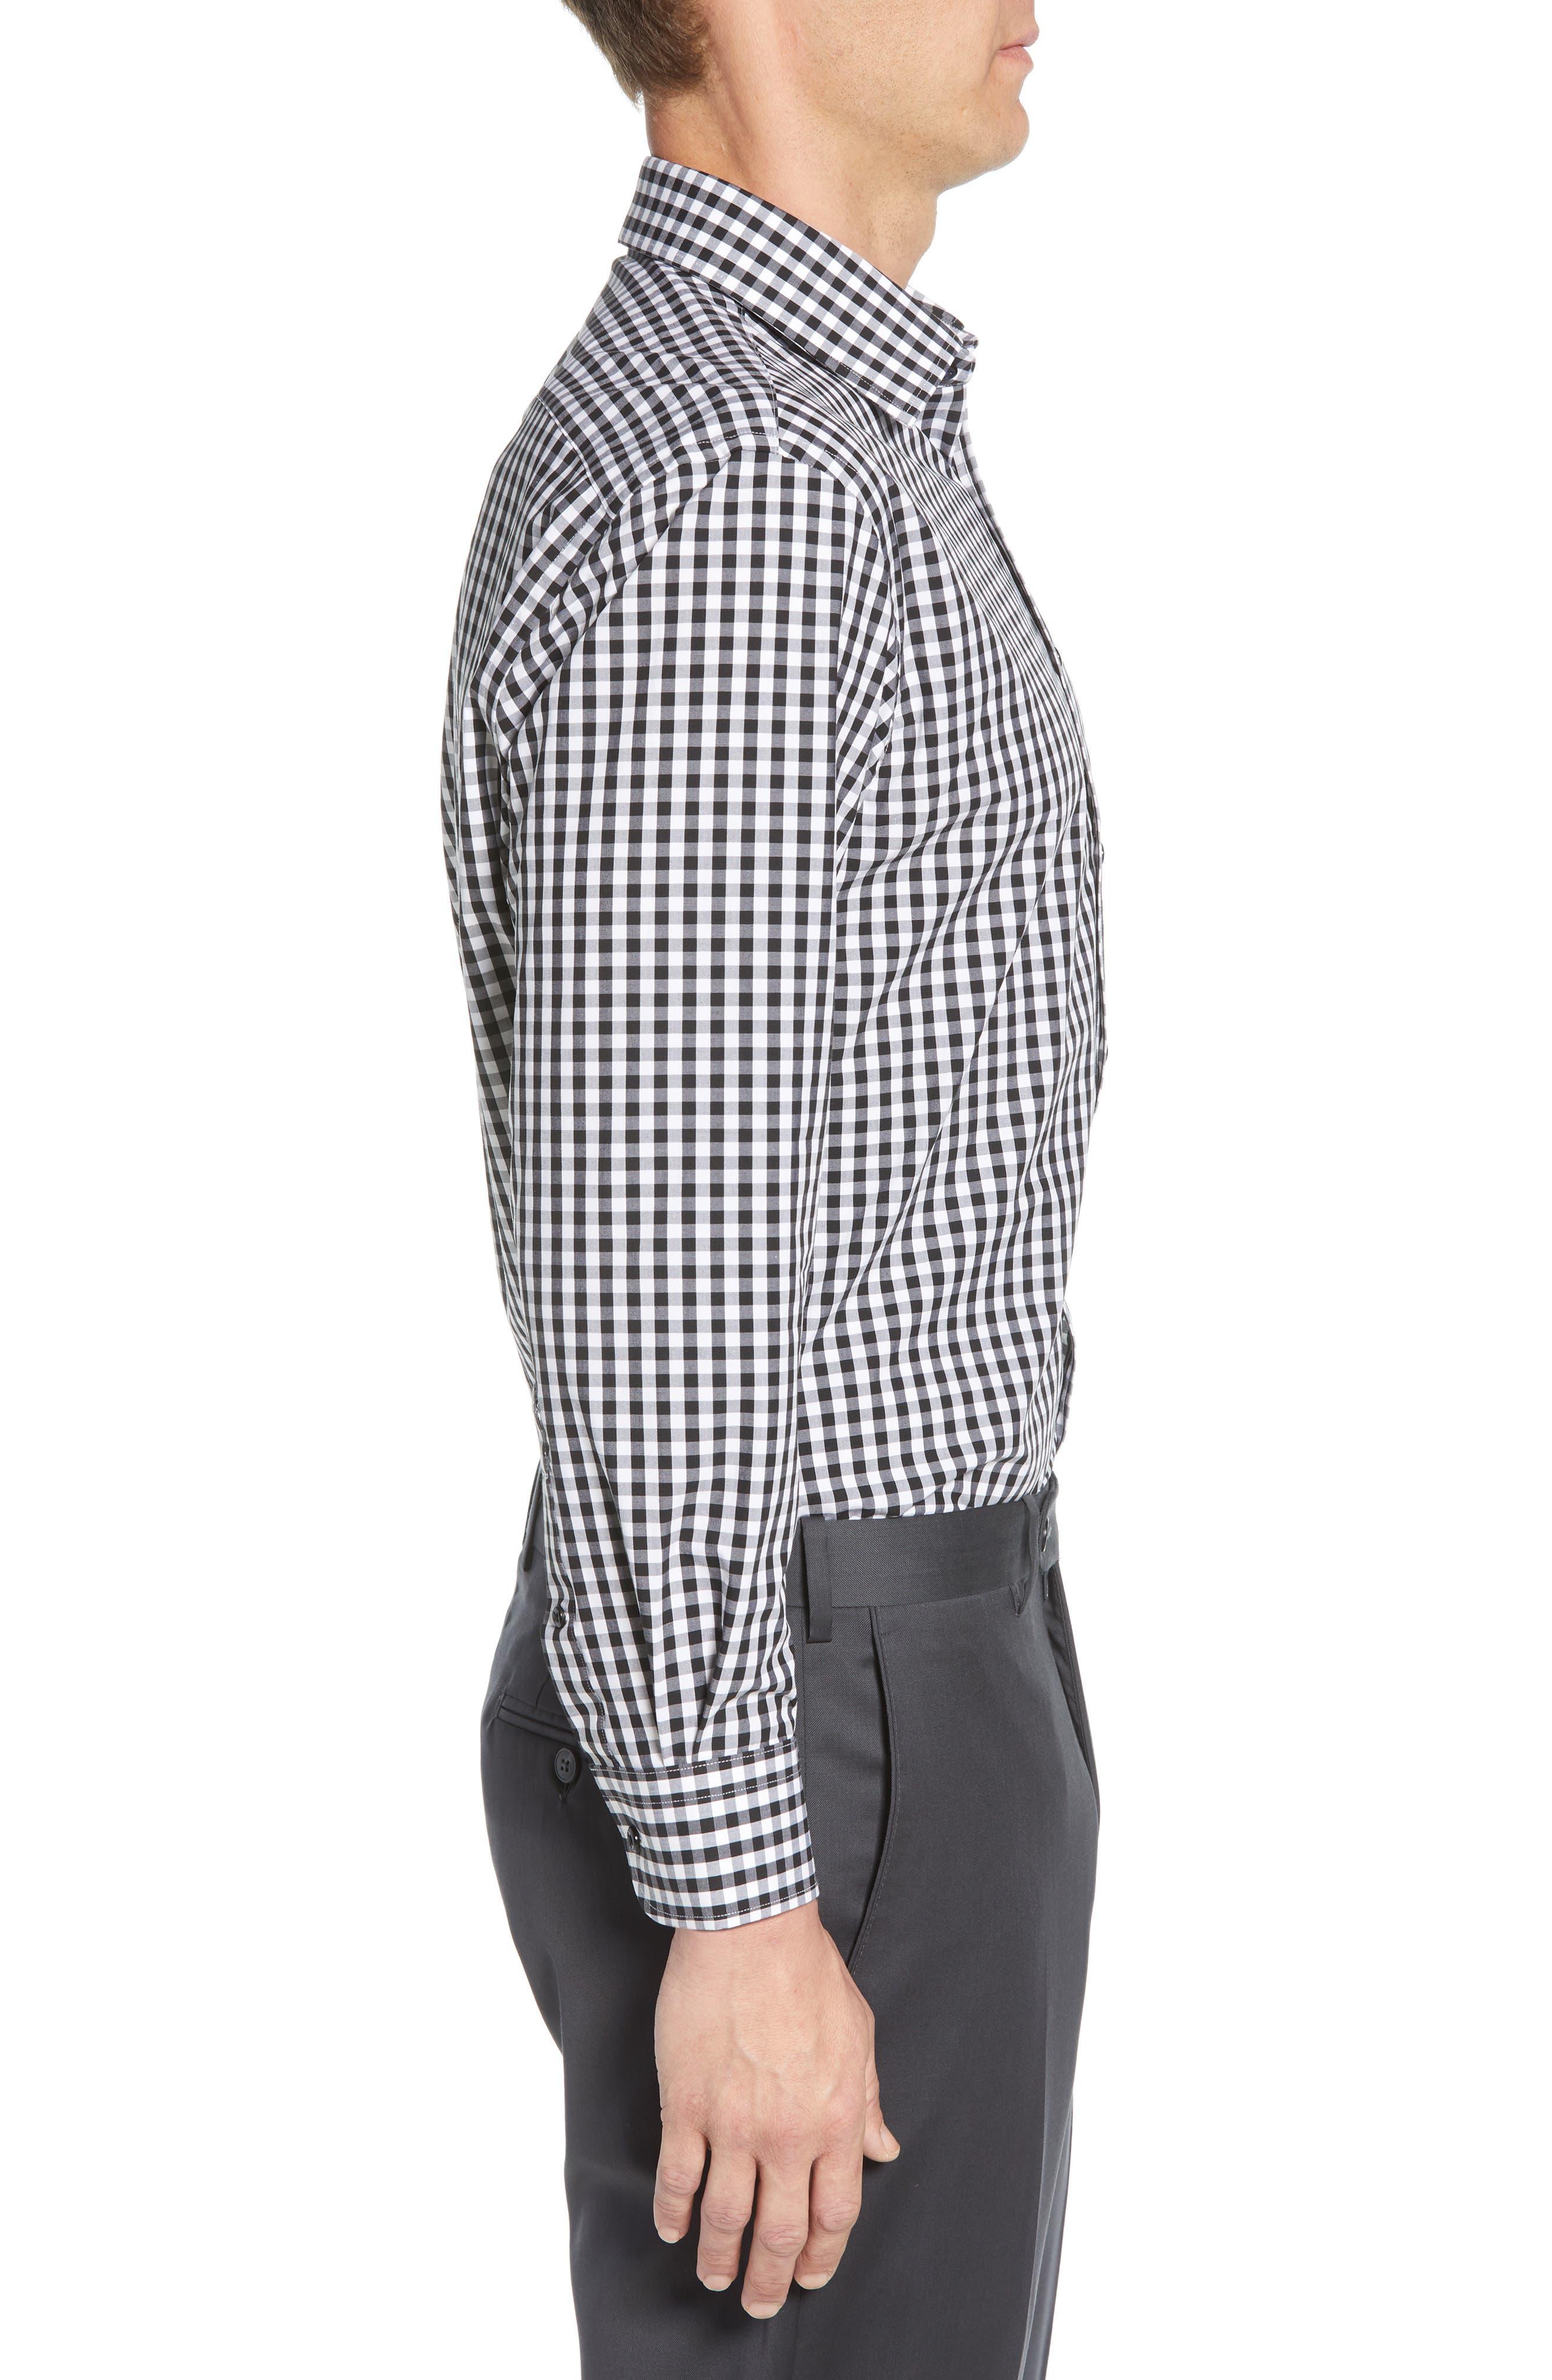 NORDSTROM MEN'S SHOP, Tech-Smart Traditional Fit Stretch Check Dress Shirt, Alternate thumbnail 4, color, BLACK ROCK